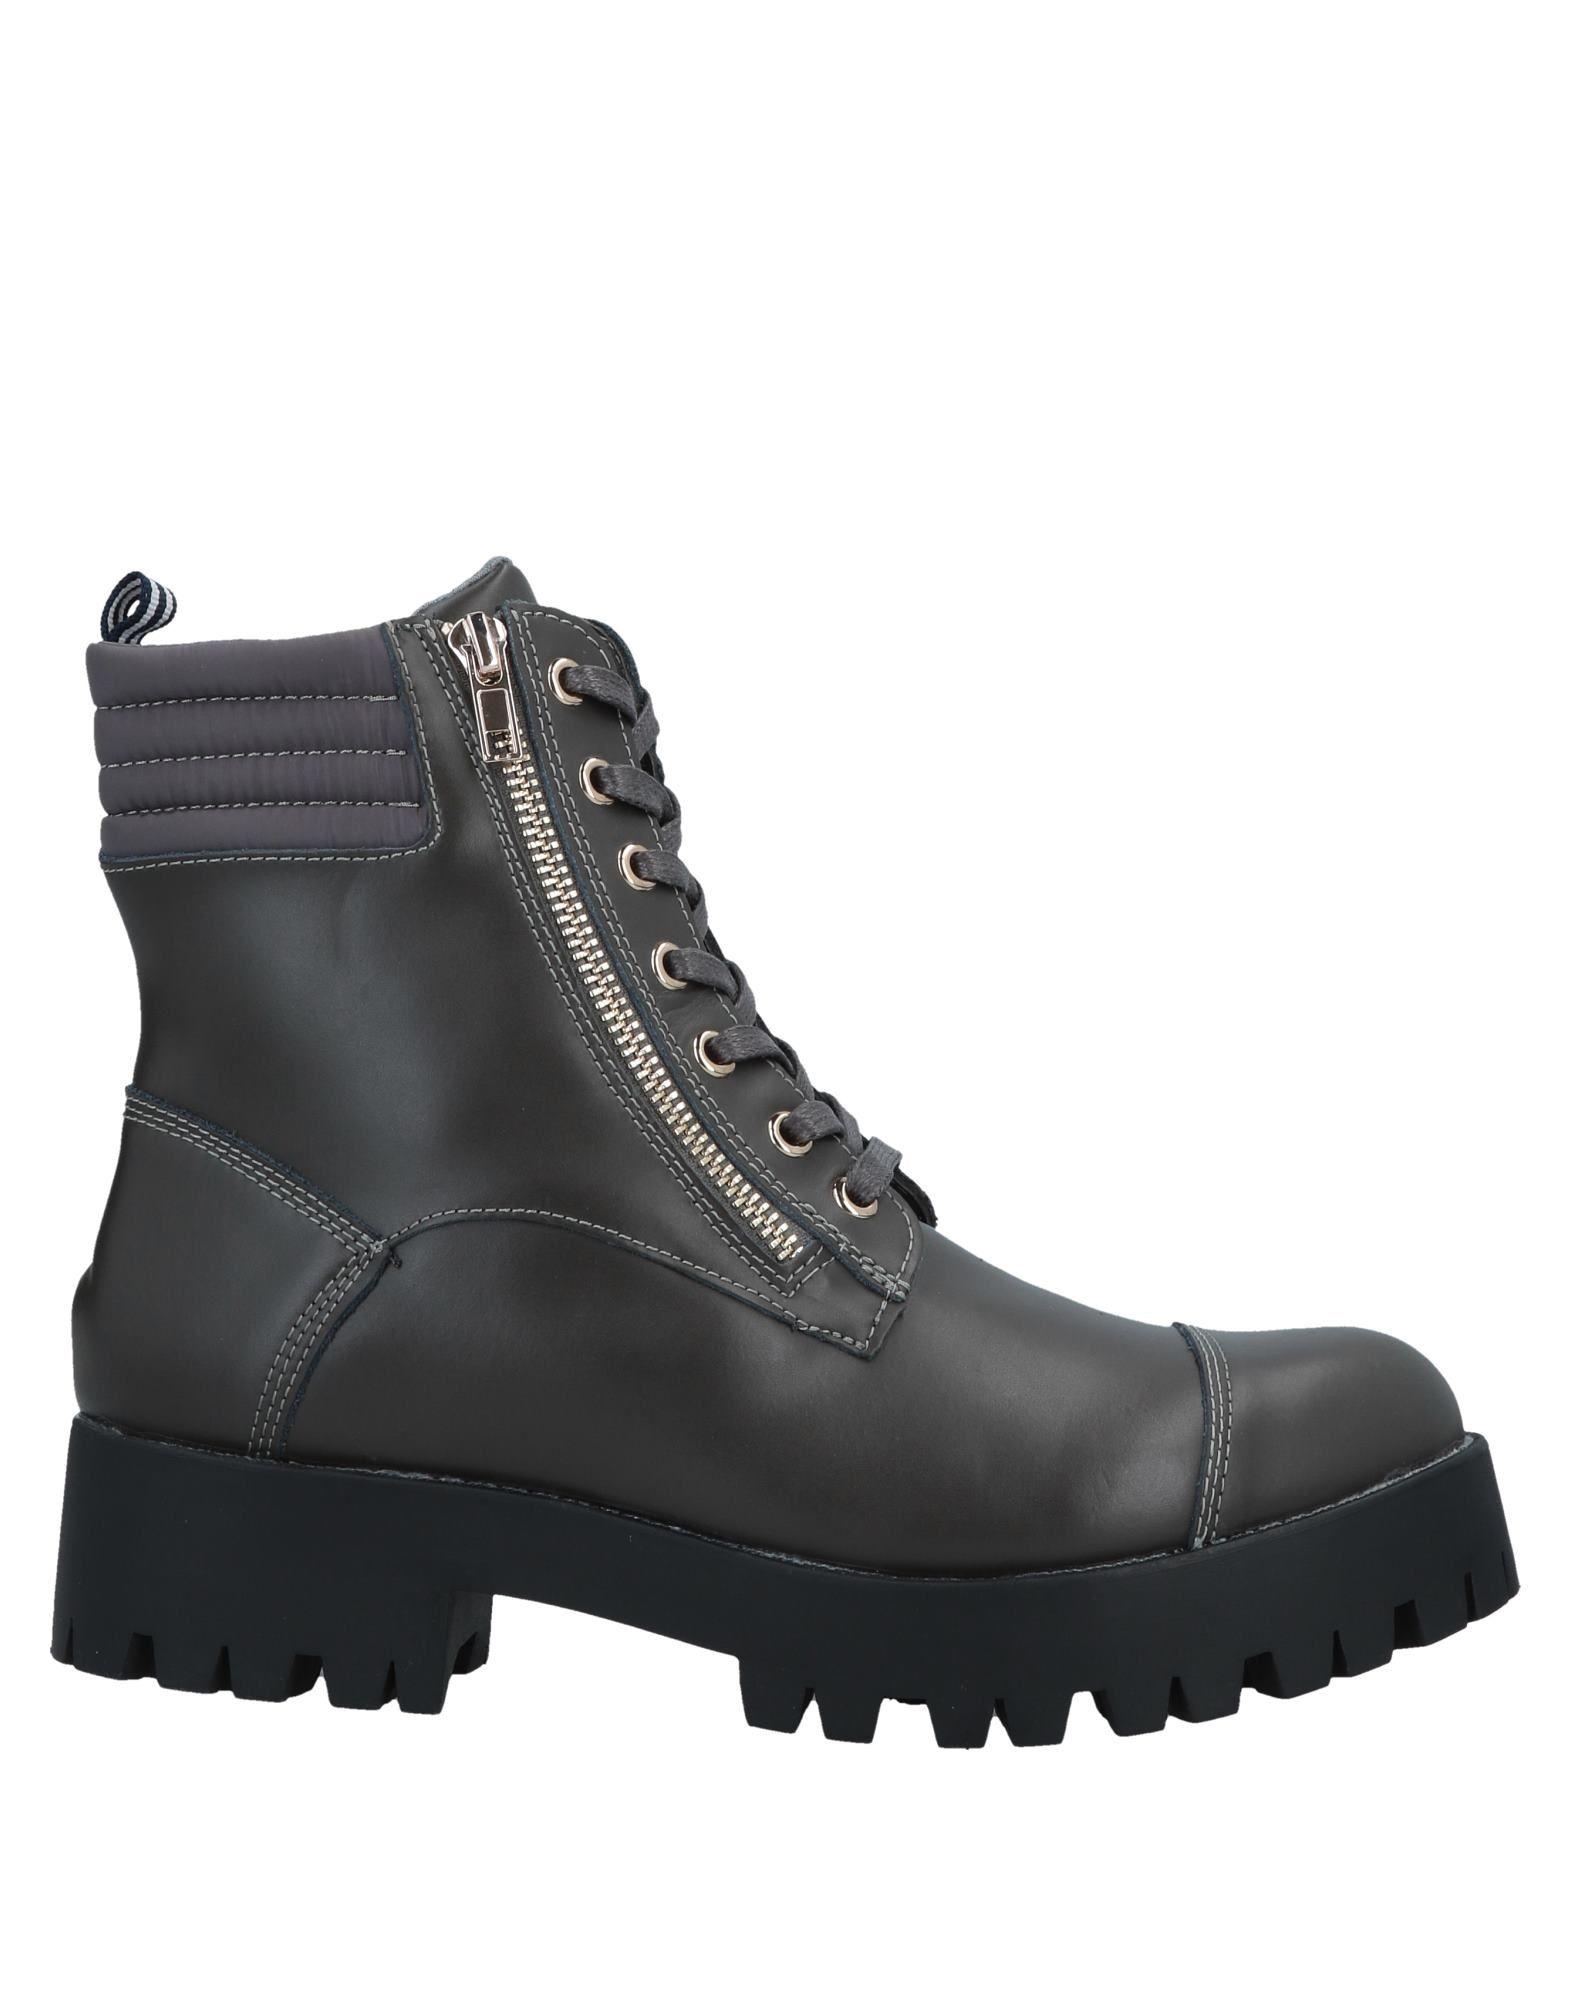 MARINA YACHTING Полусапоги и высокие ботинки marina grey полусапоги и высокие ботинки